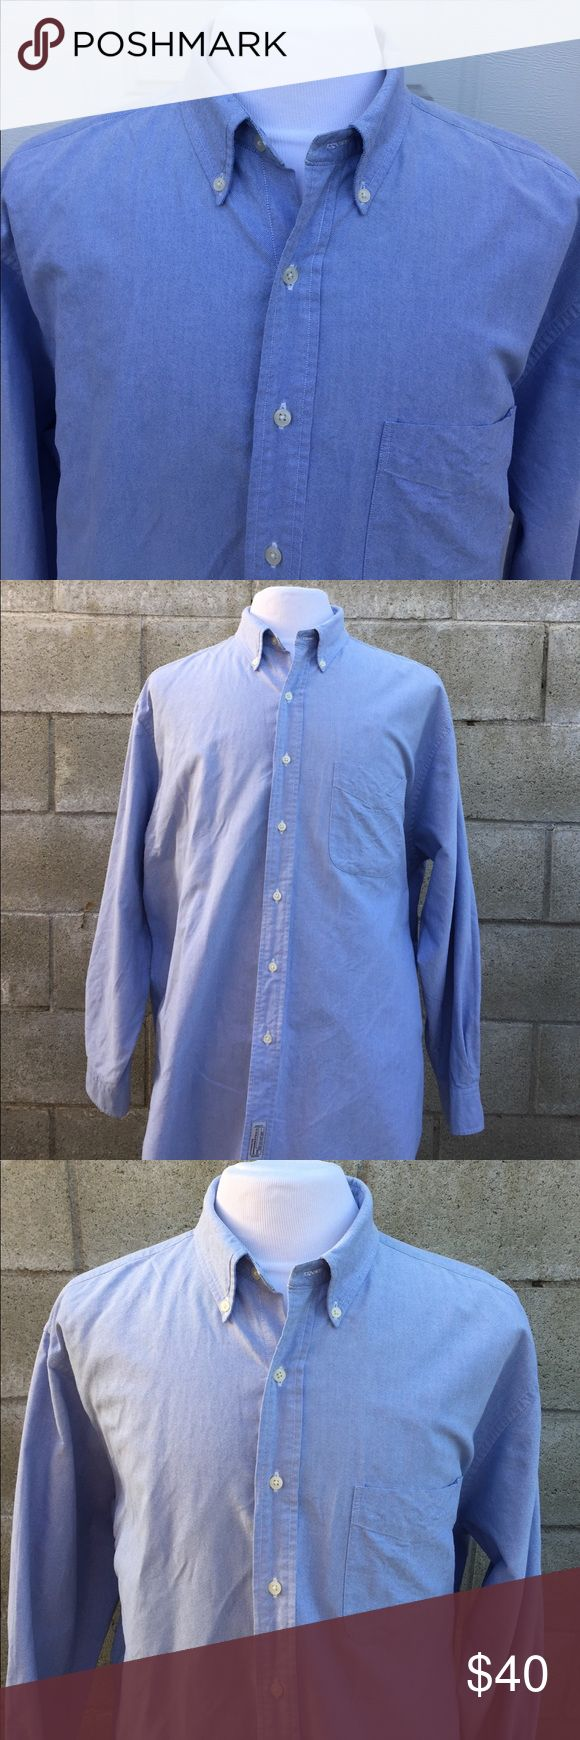 Abercrombie & Fitch Oxford Button Down 17L Blue Abercrombie & Fitch Oxford Button Down 17L Blue lightly used. Abercrombie & Fitch Shirts Casual Button Down Shirts